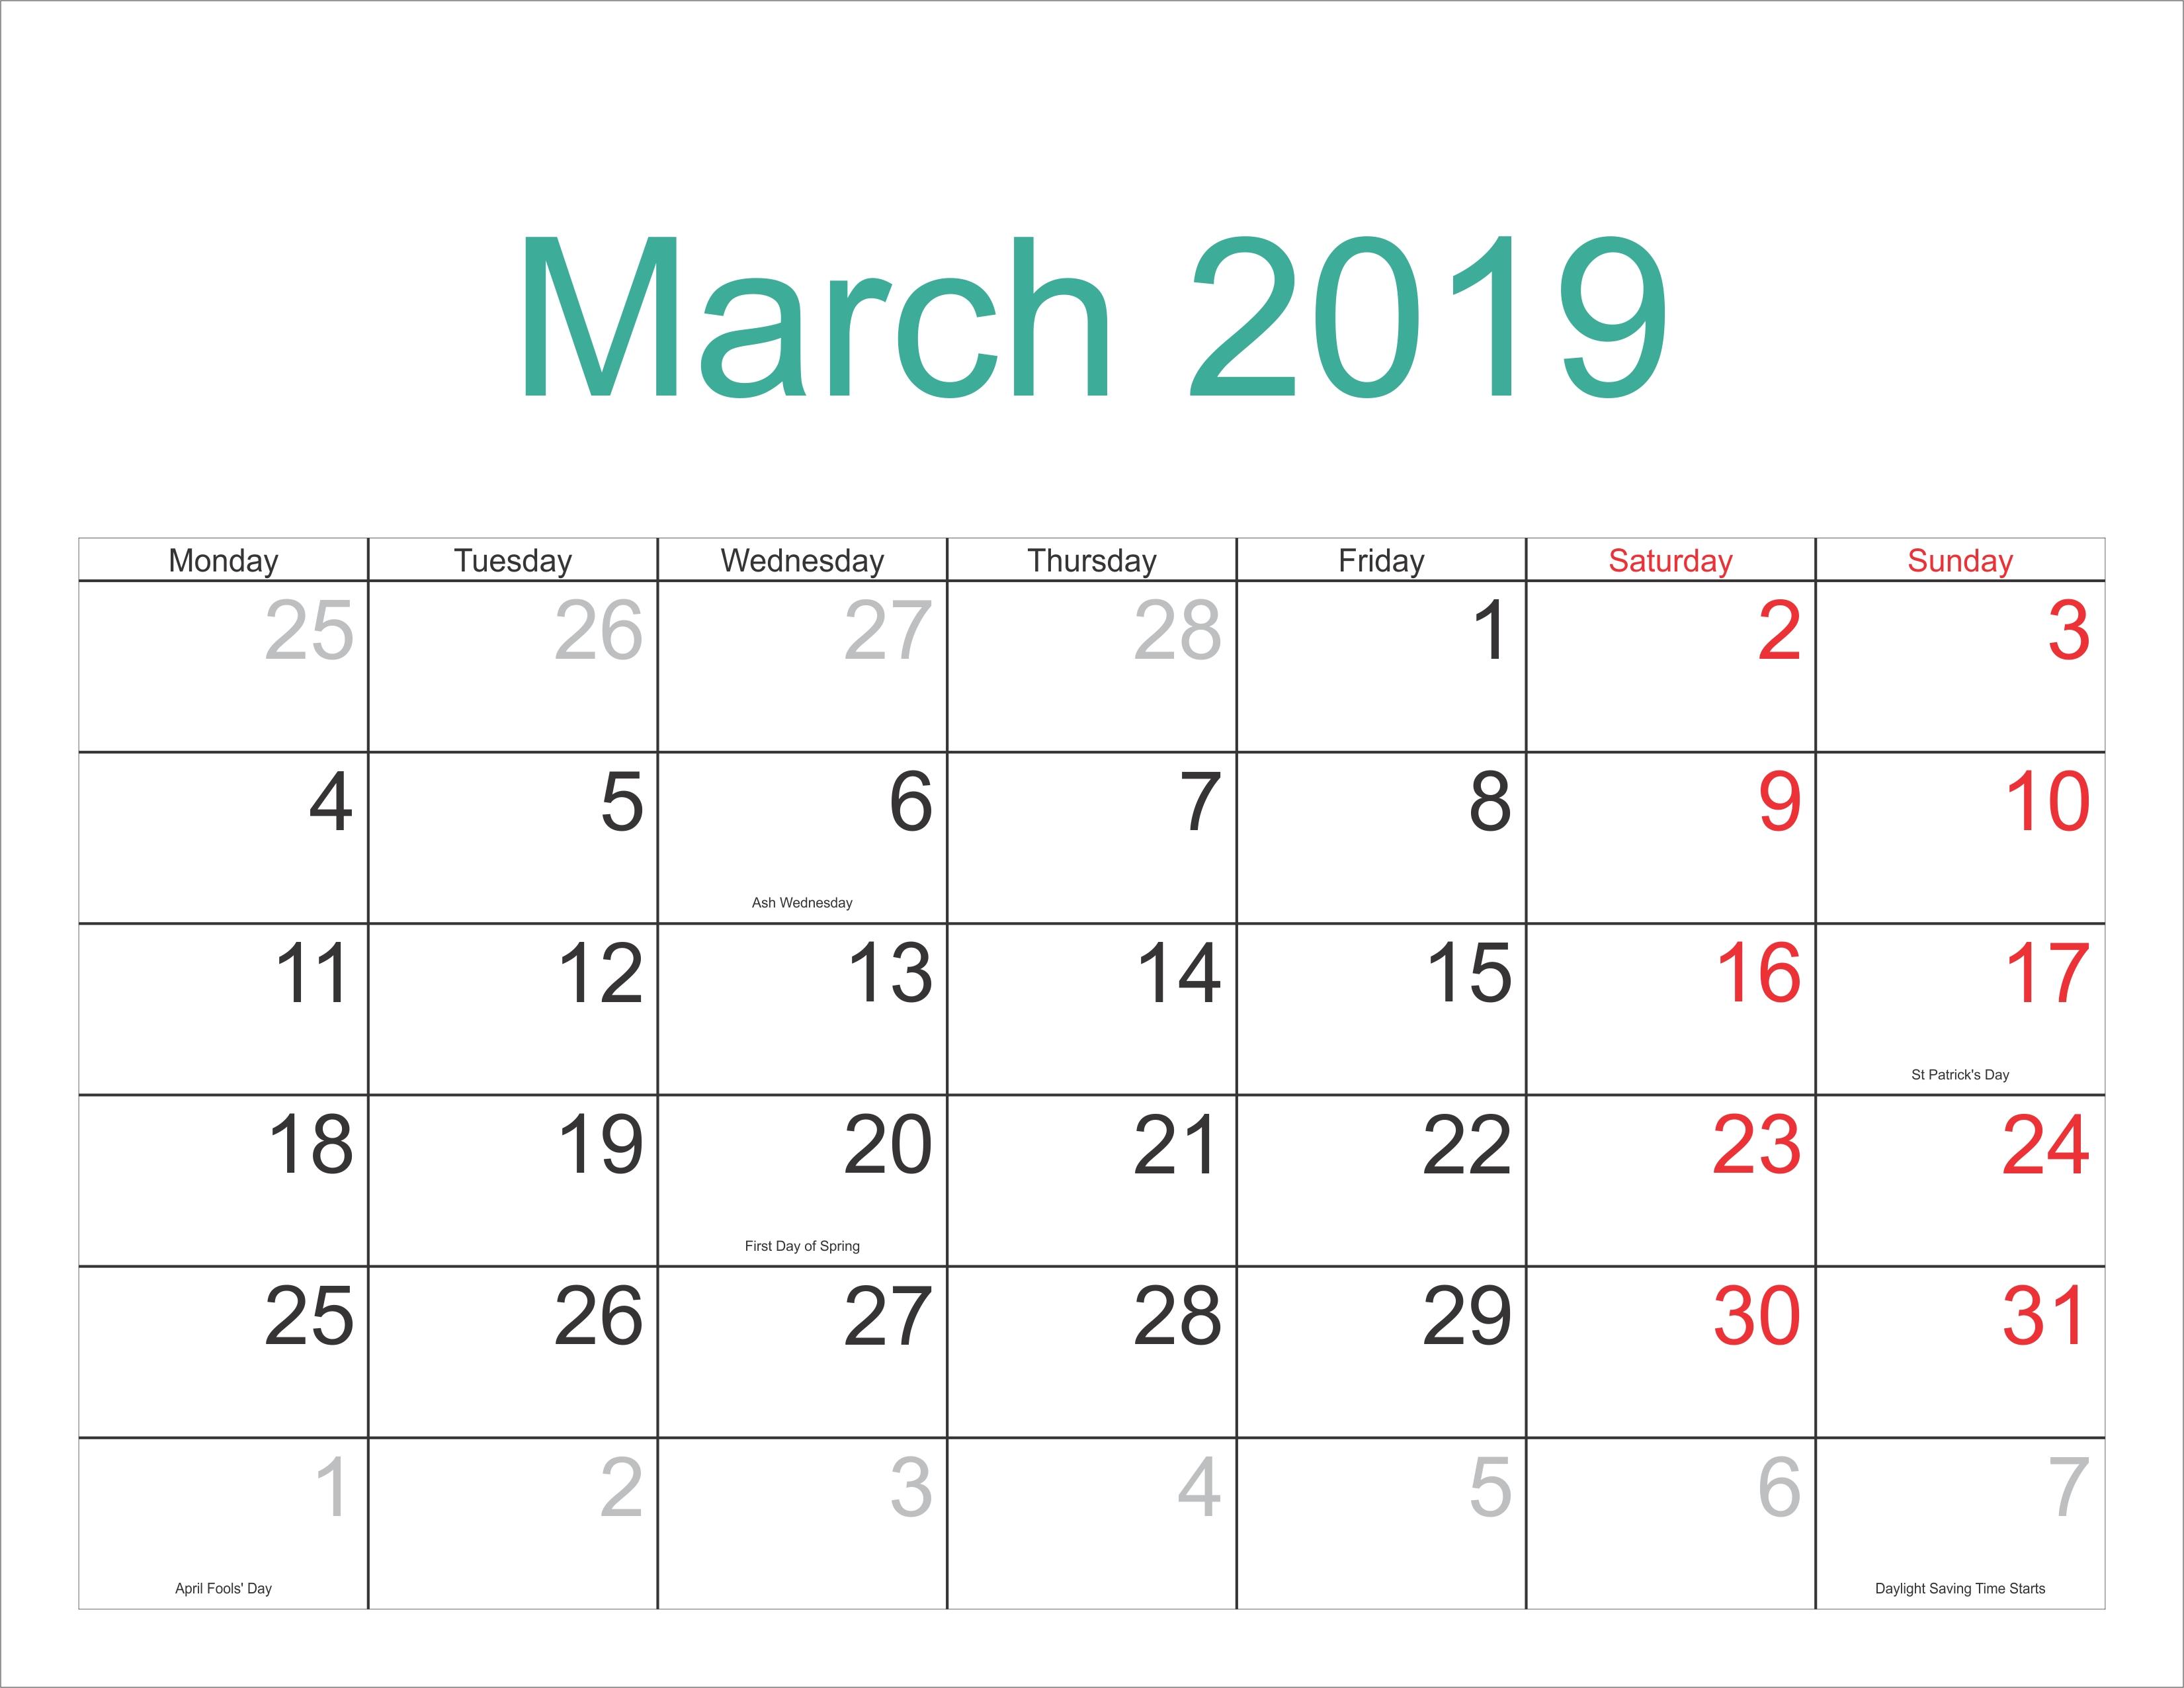 Download Printable March 2019 Calendar With Holidays | Calendar 2018 Calendar 2019 Full Moon